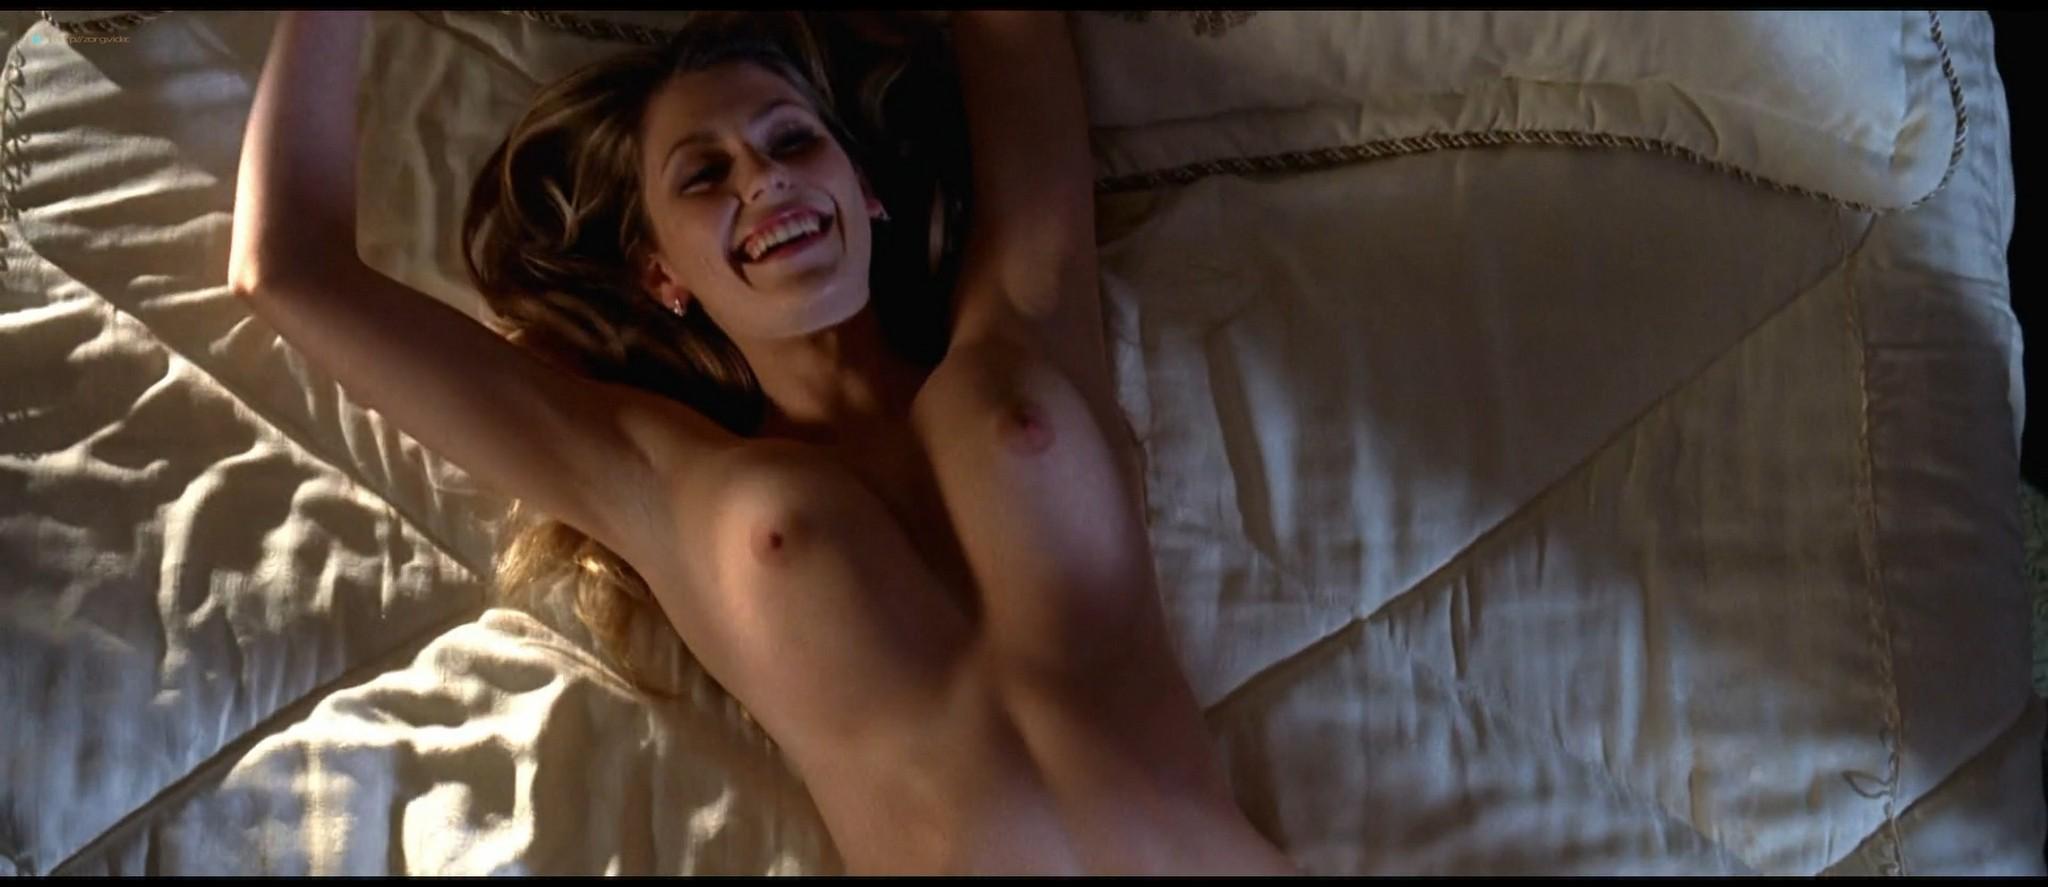 Diora Baird nude topless huge boobs others nude too - Wedding Crashers (2005) HD 1080p BluRay (7)